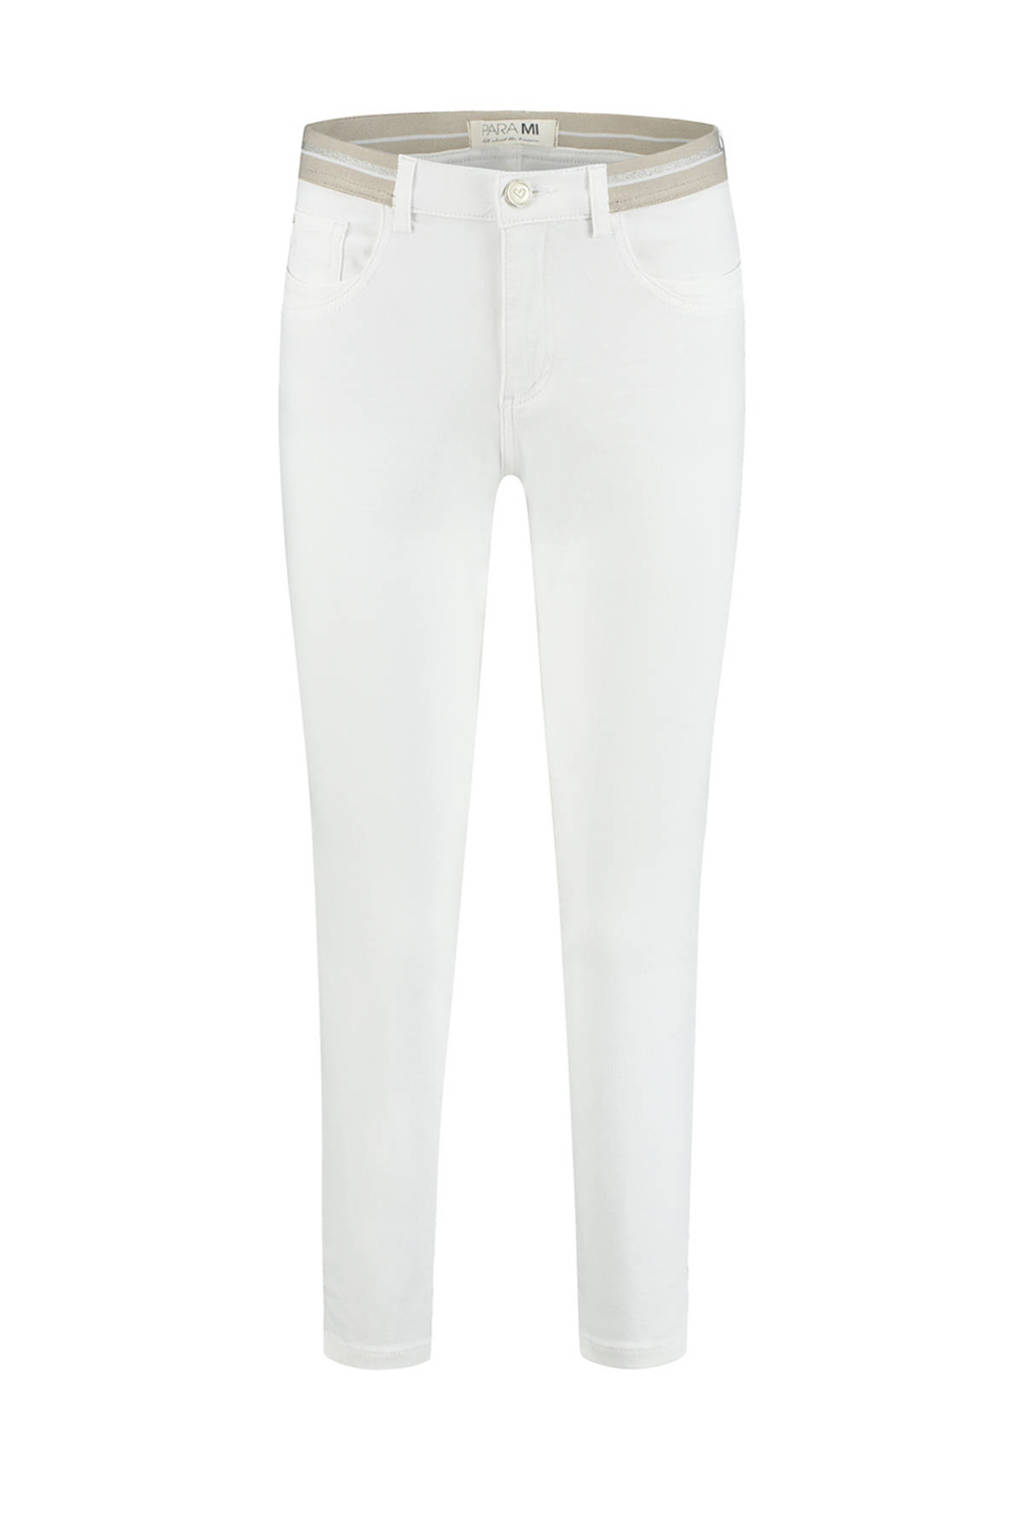 Para Mi slim fit capri Capri (Elastic) / Color Denim 002 - white, 002 - White